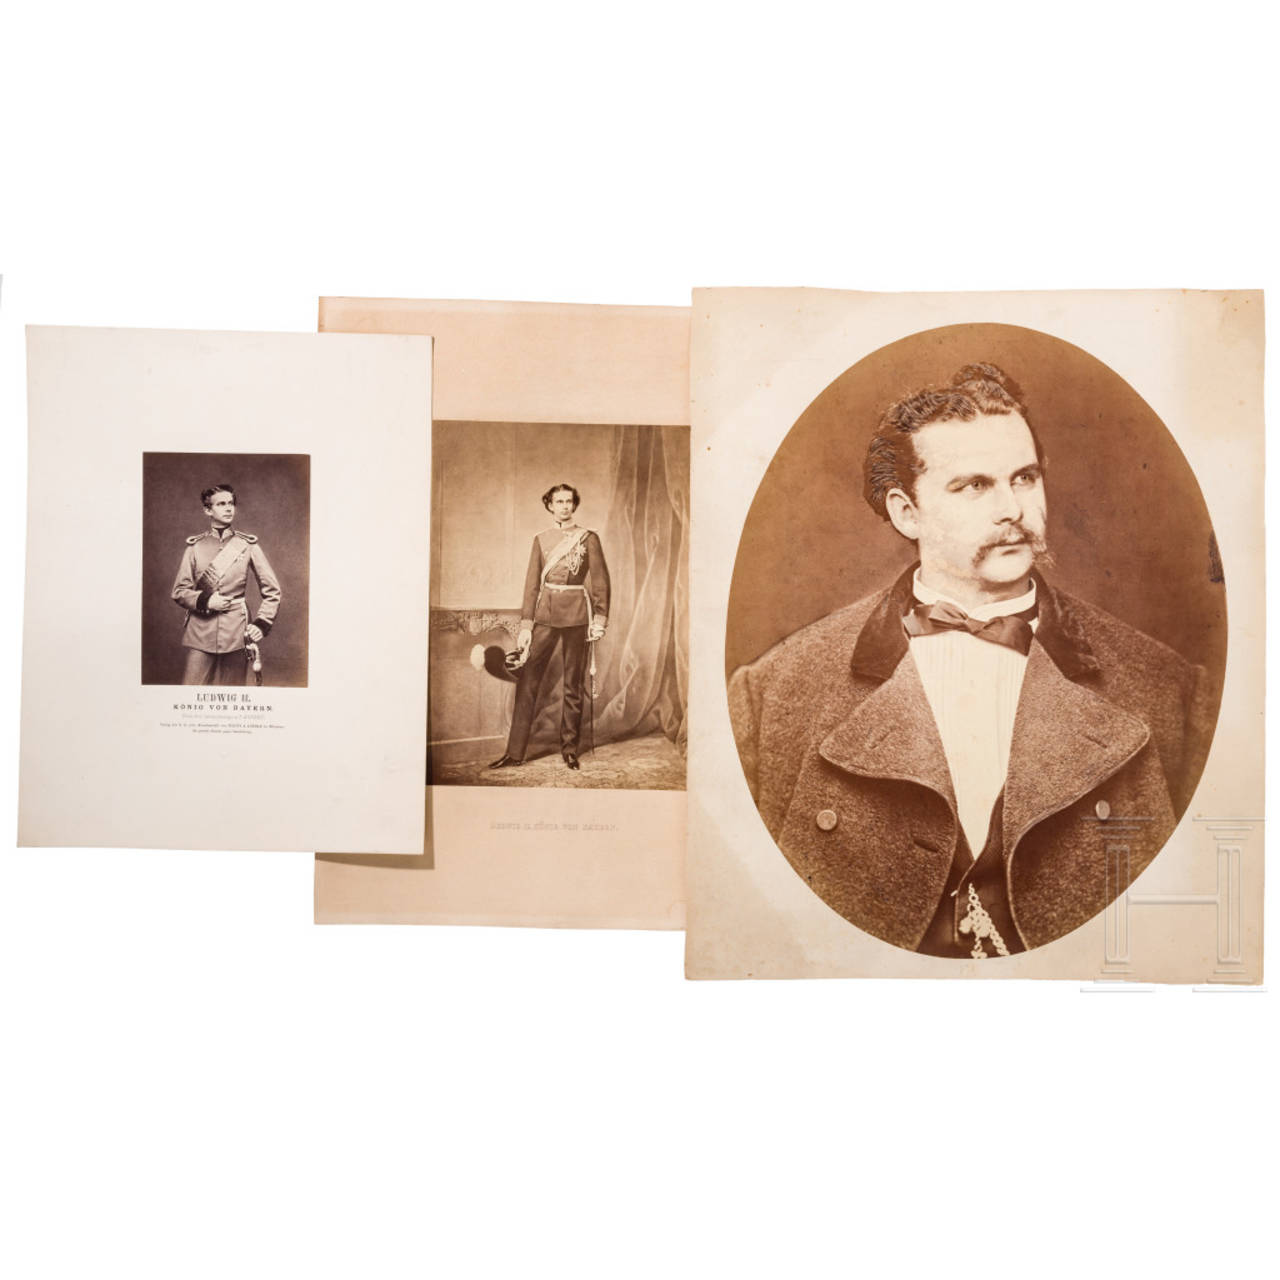 Family of the Freiherrn von Leonrod – large-size gift portraits of King Ludwig II of Bavaria